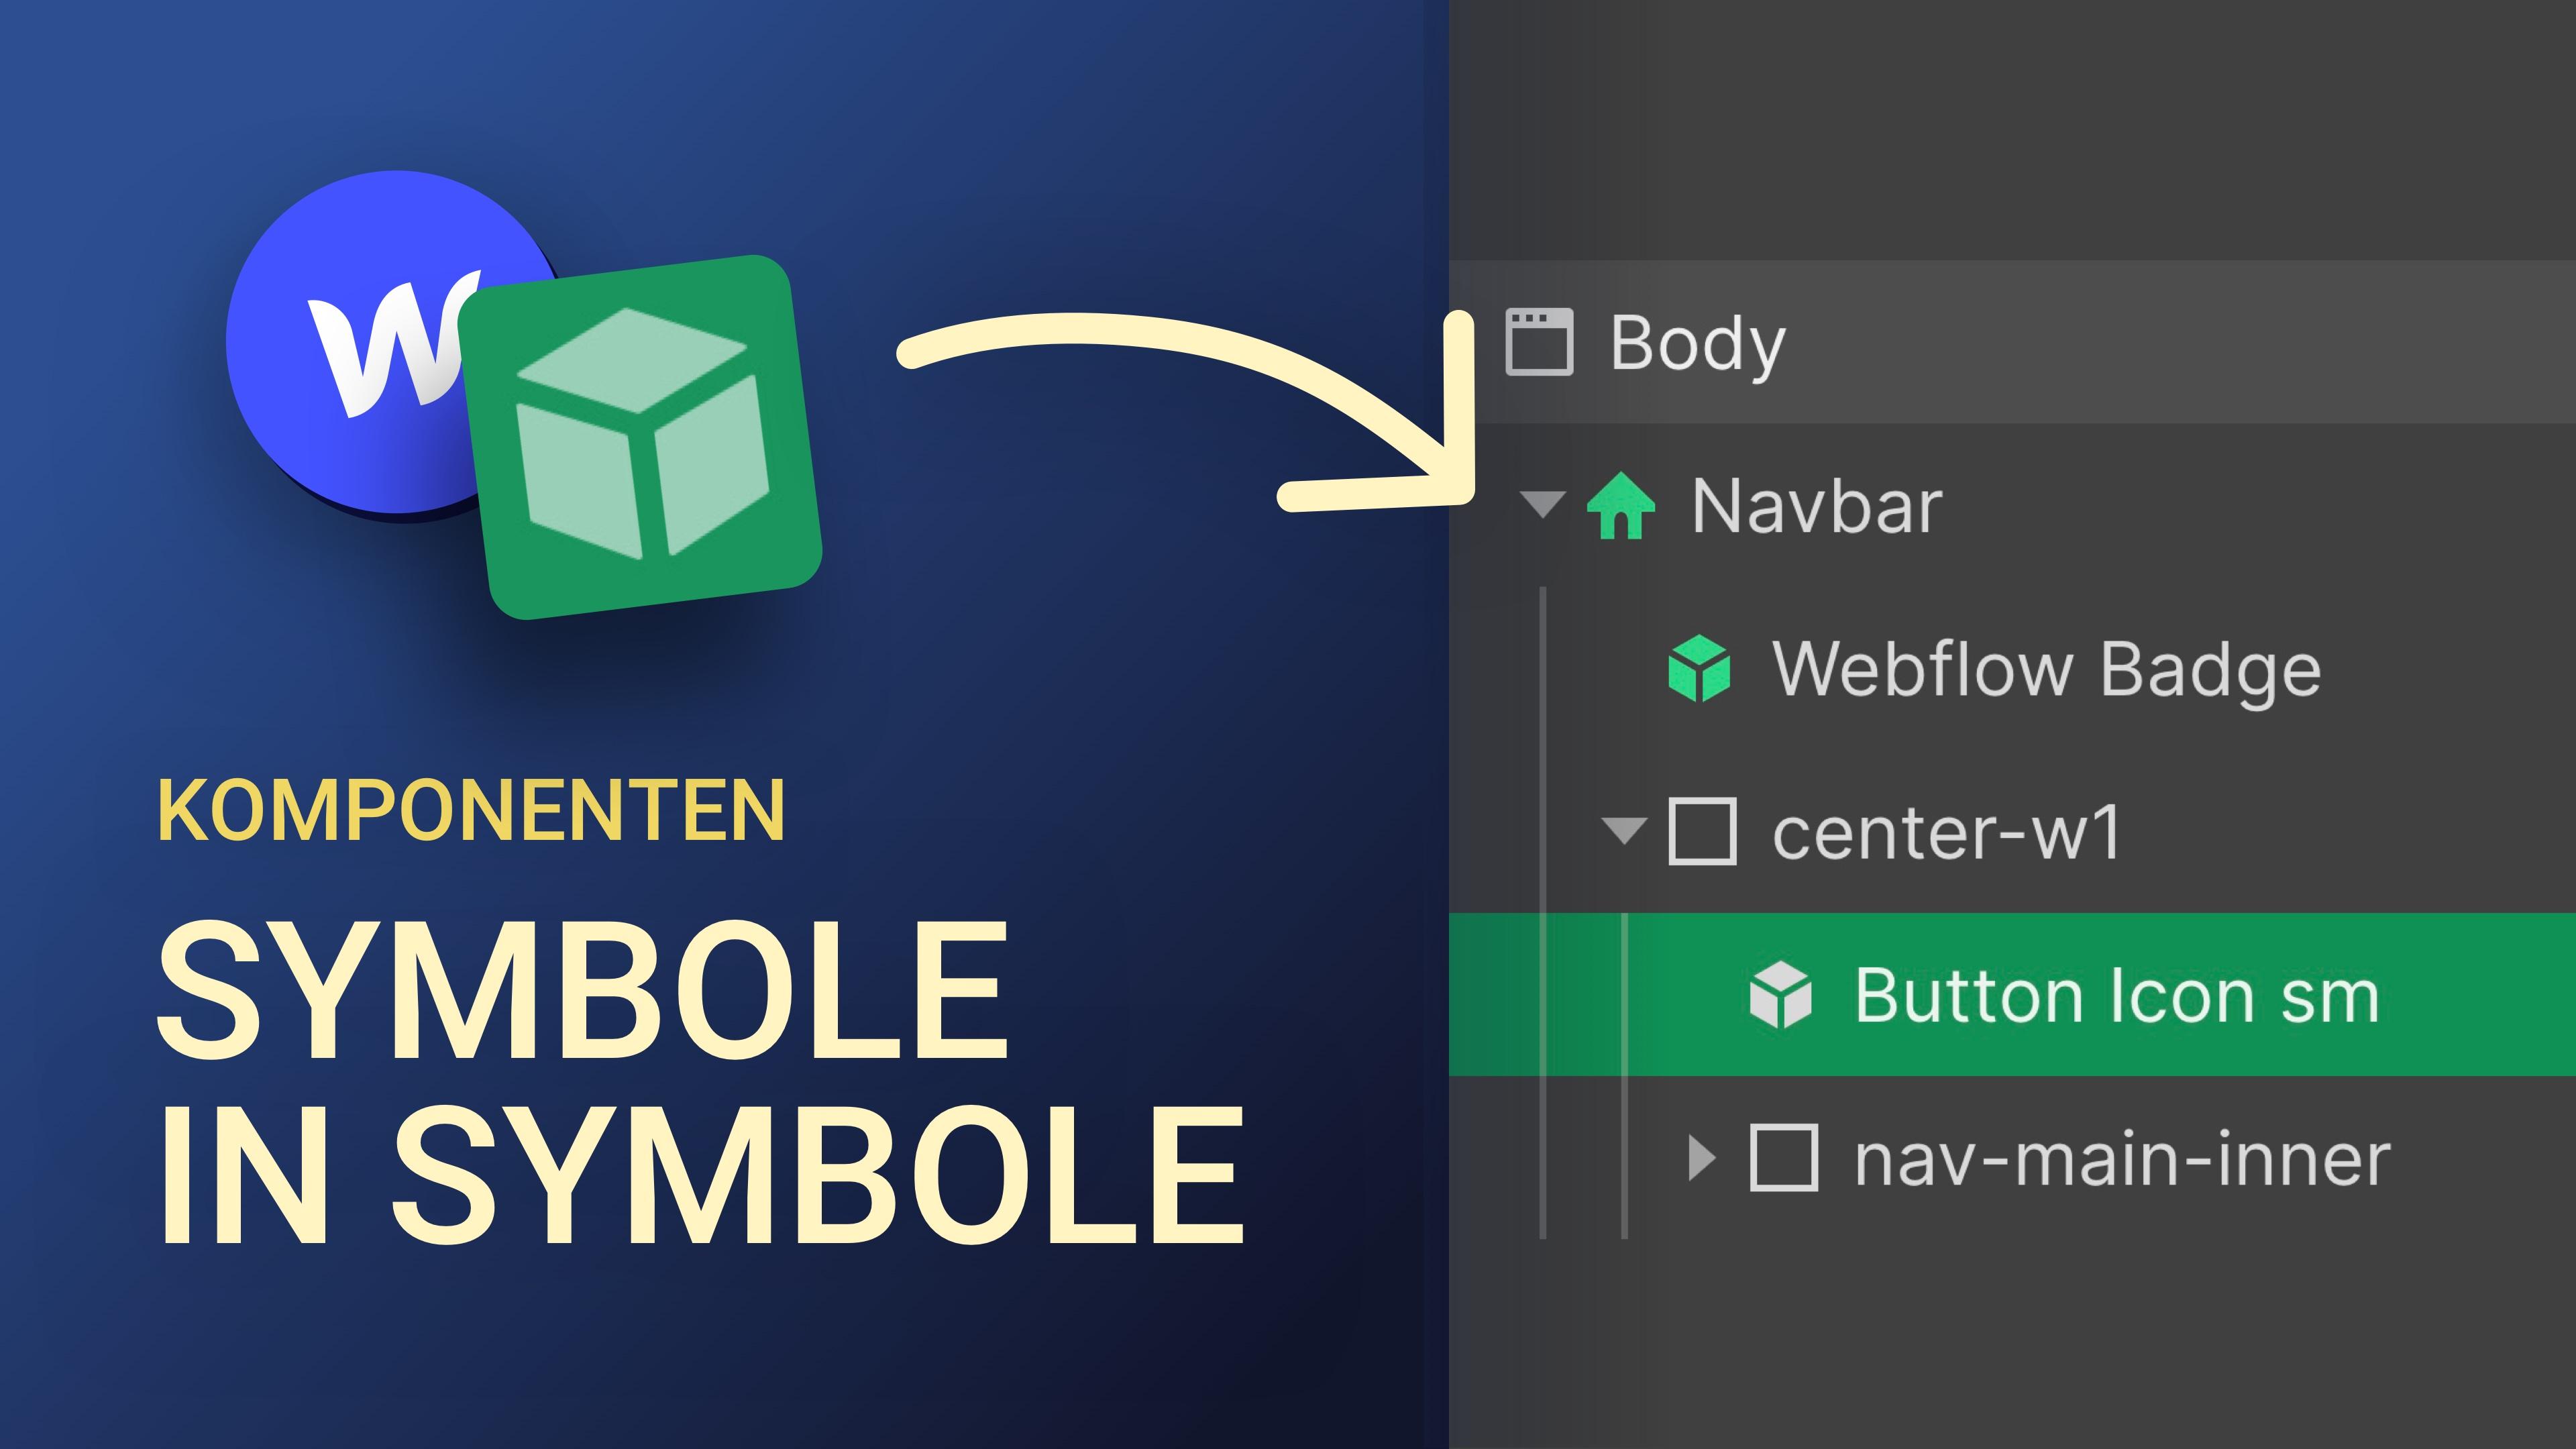 Symbole in Symbole kopieren – Komponenten in Webflow verschachteln